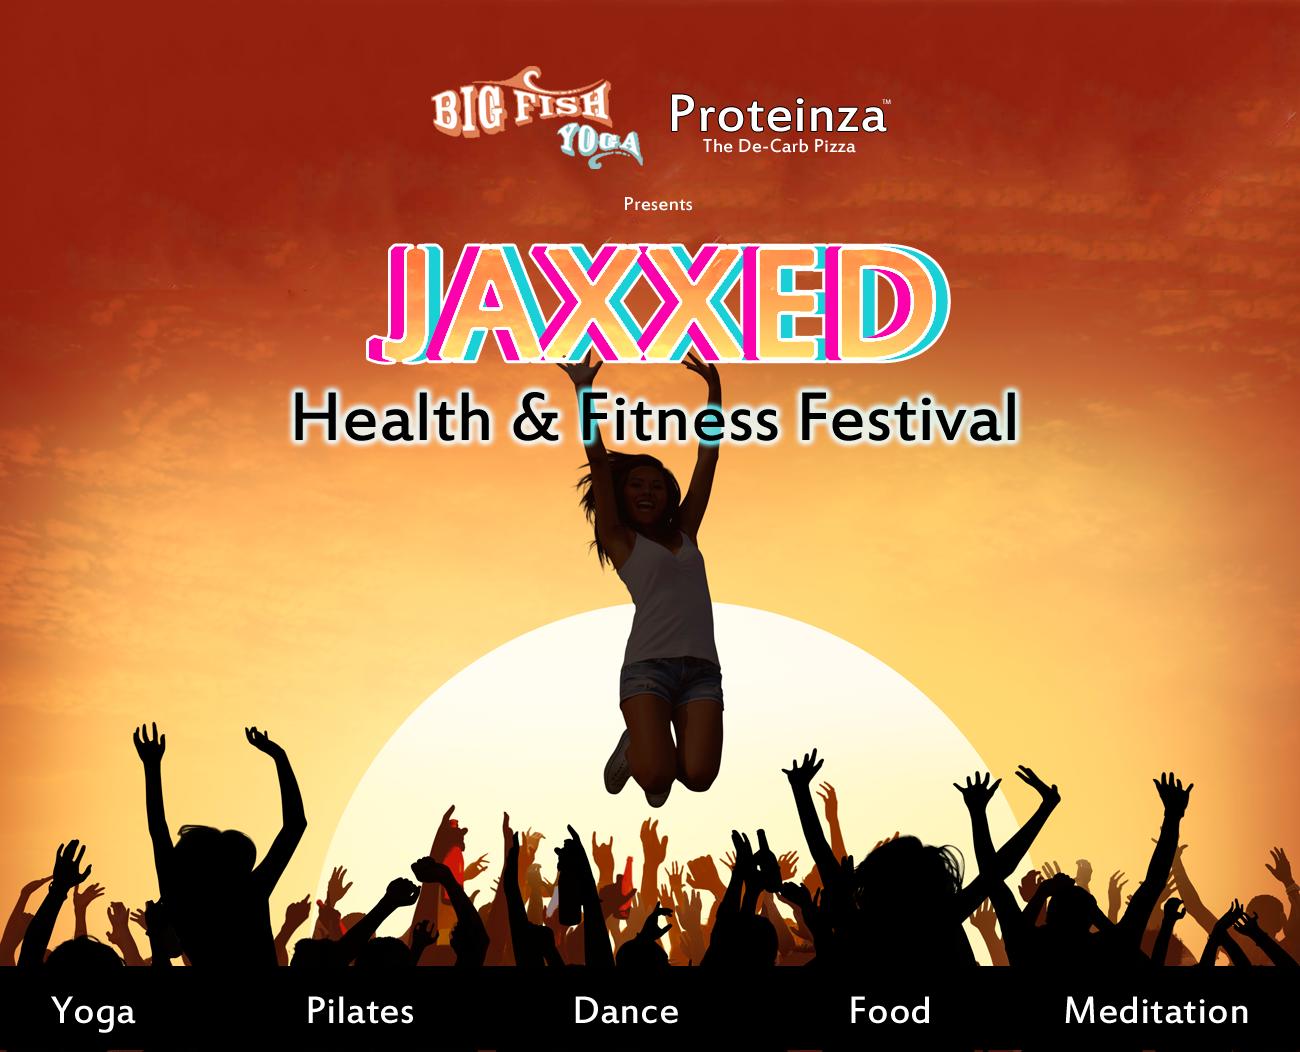 JAXXED Health and Fitness Festival